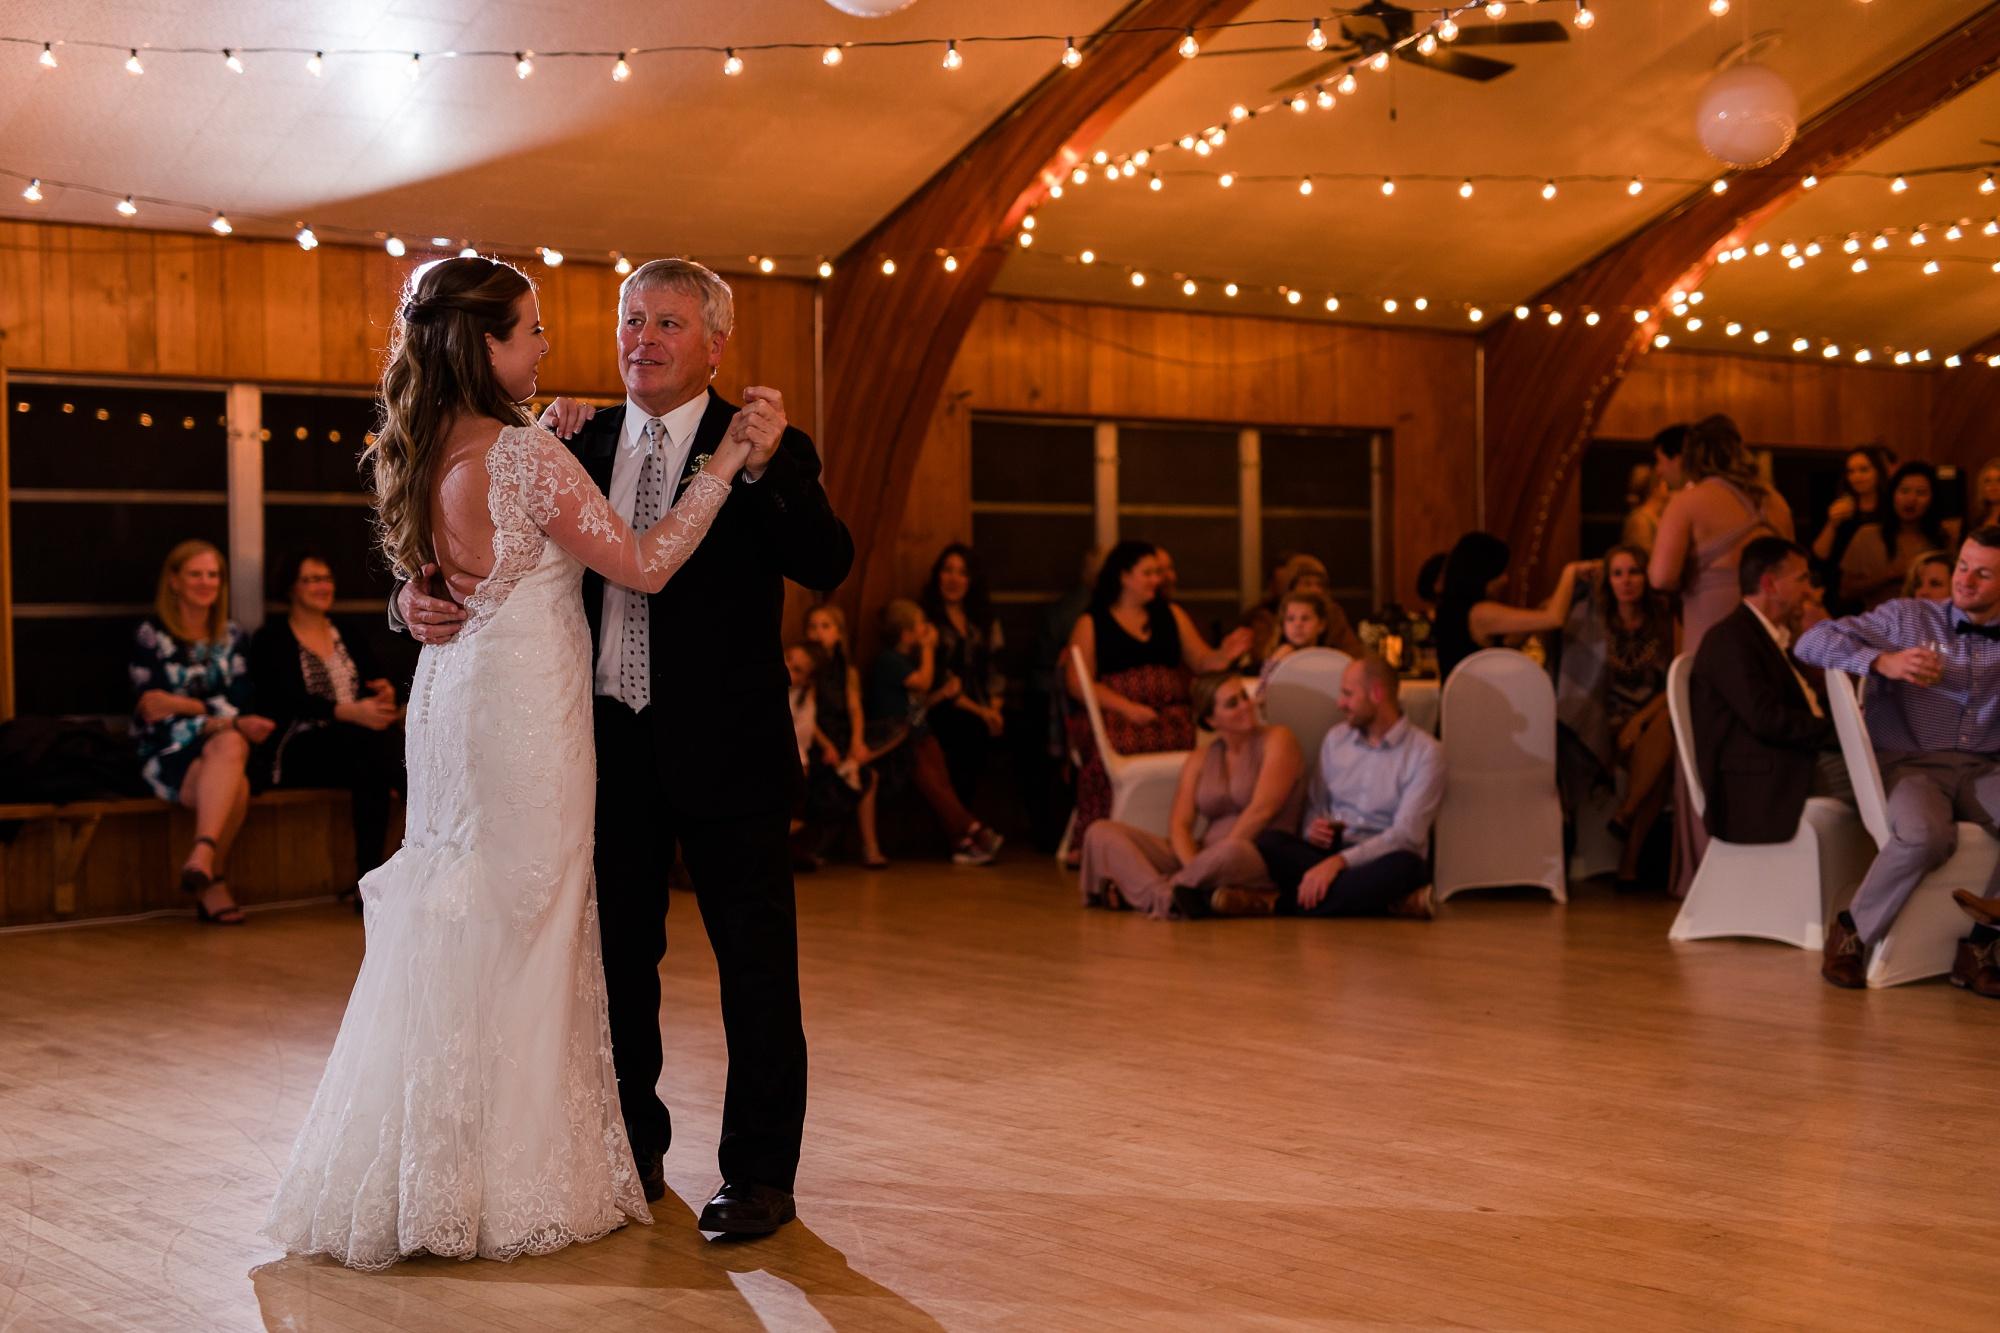 AmberLangerudPhotography_Fair Hills Resort Lakeside Wedding in Minnesota_3498.jpg